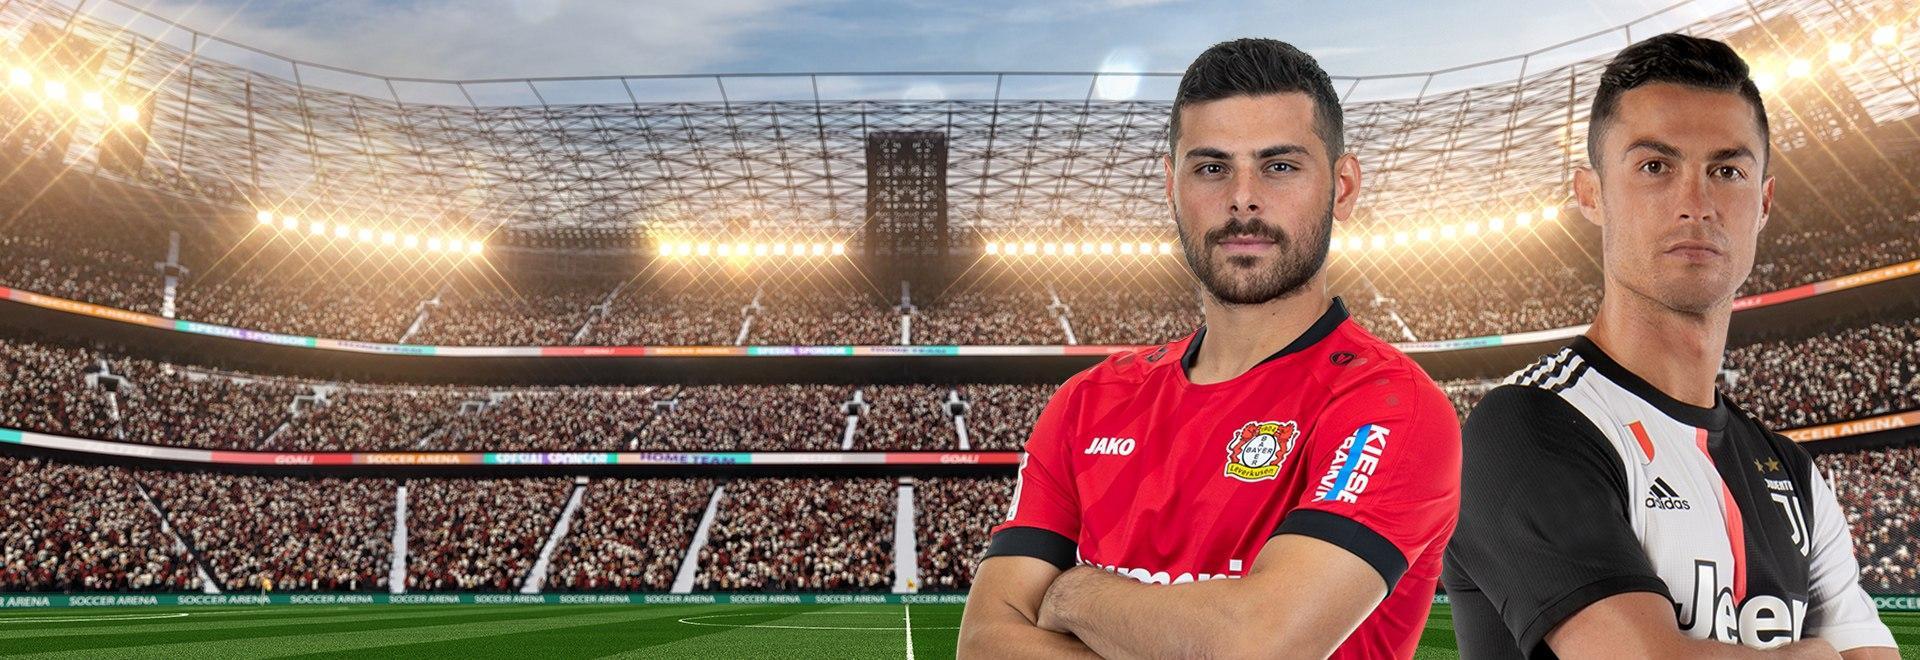 Bayer L. - Juventus. 6a g.